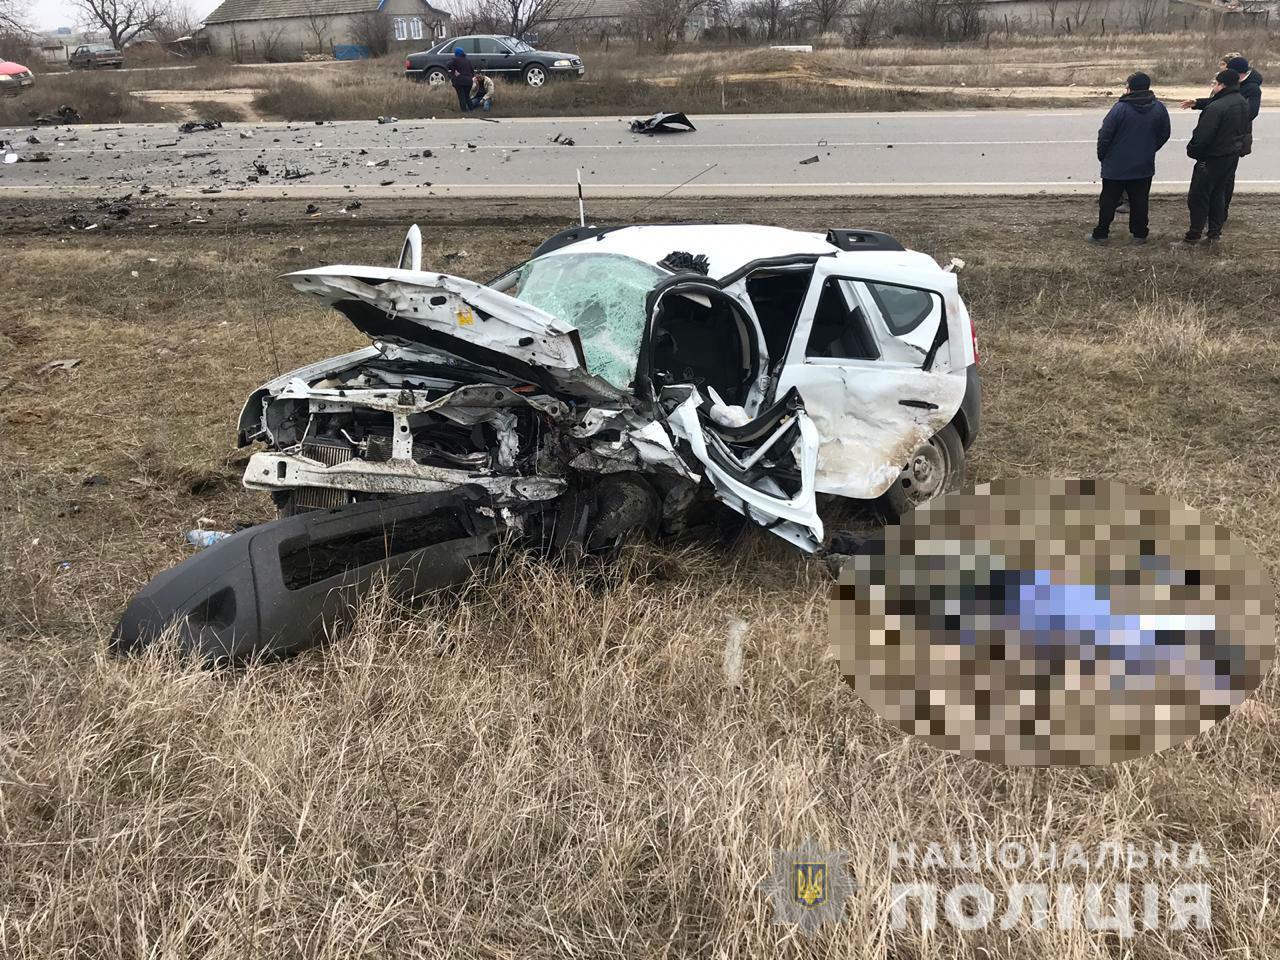 Еще одно смертельное ДТП на трассе Одесса-Рени: возле Баштановки погибли два человека